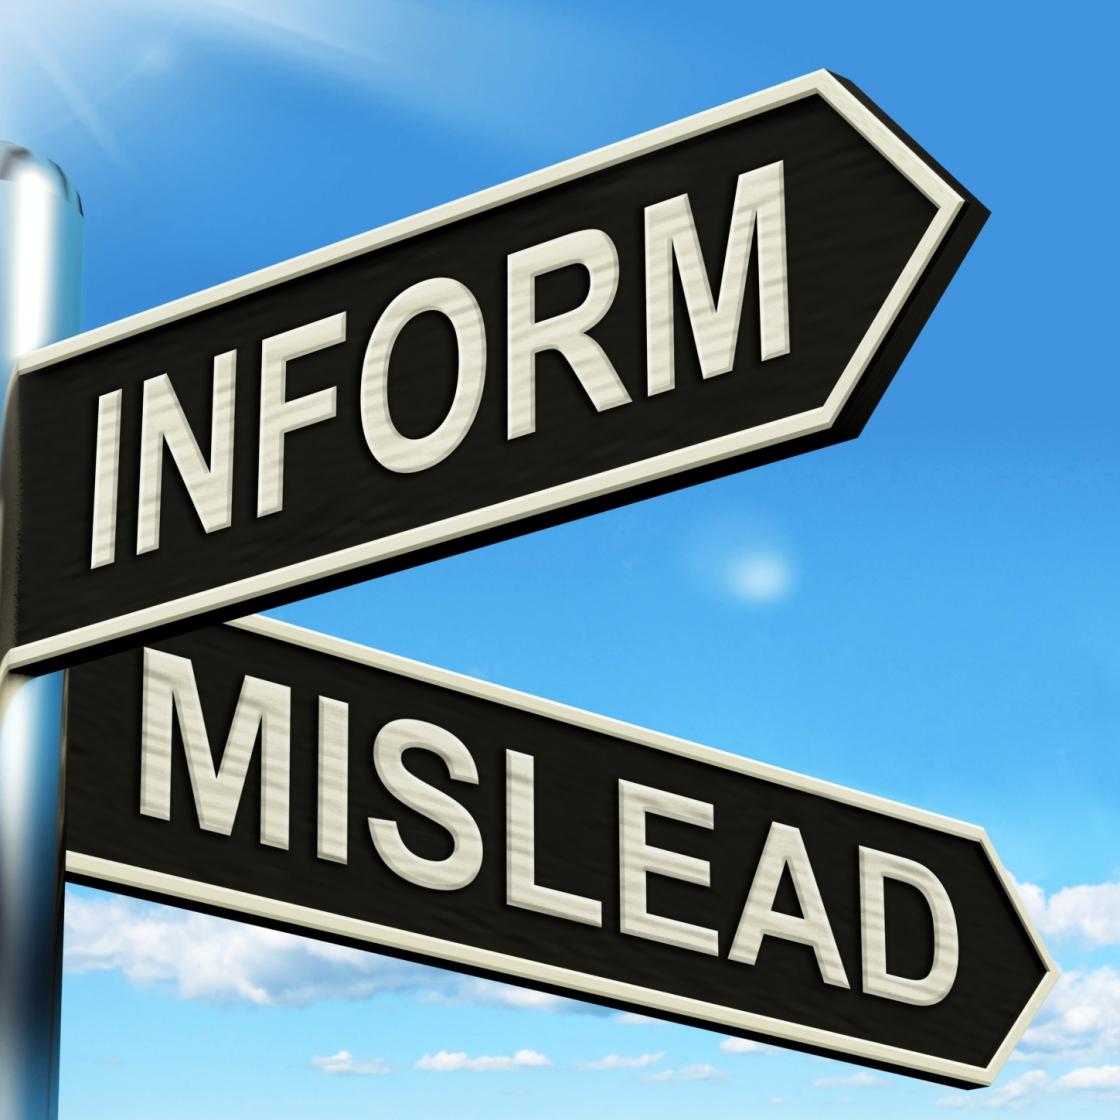 Inform Mislead Signpost Means Advise Or Misinform